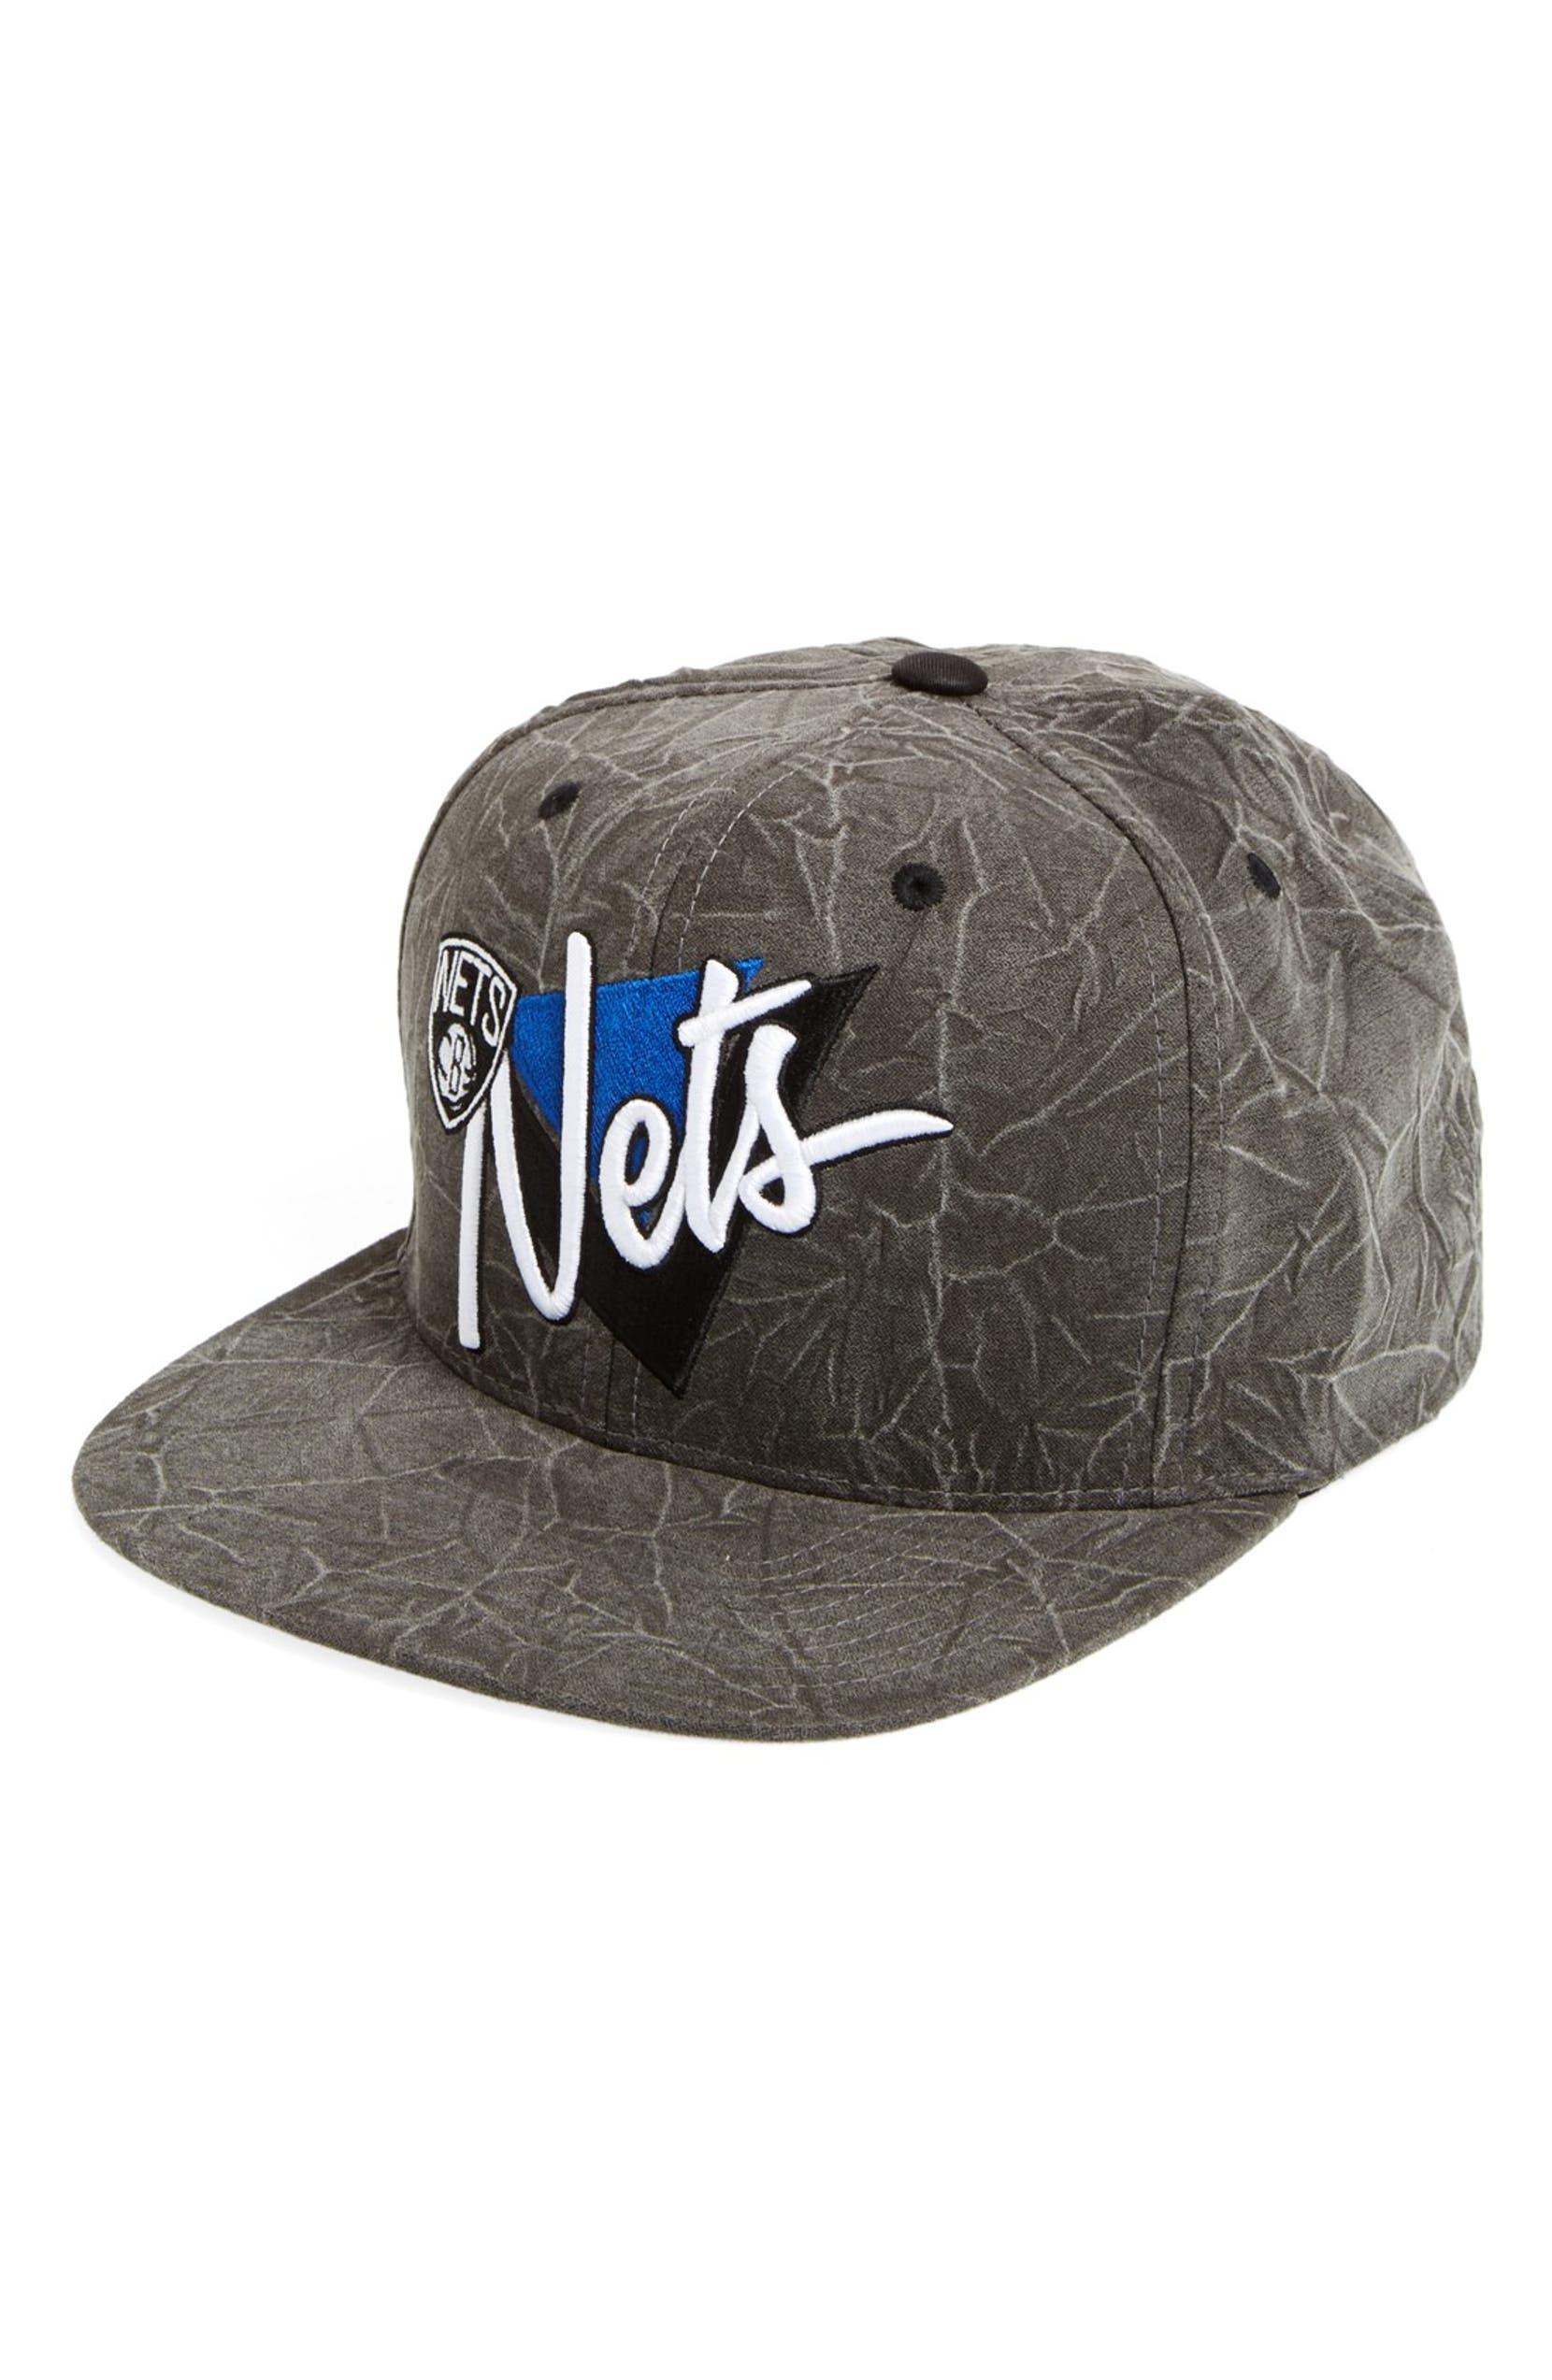 free shipping e6a68 37dd9 Mitchell   Ness  Brooklyn Nets - Crease Triangle  Snapback Baseball Cap    Nordstrom